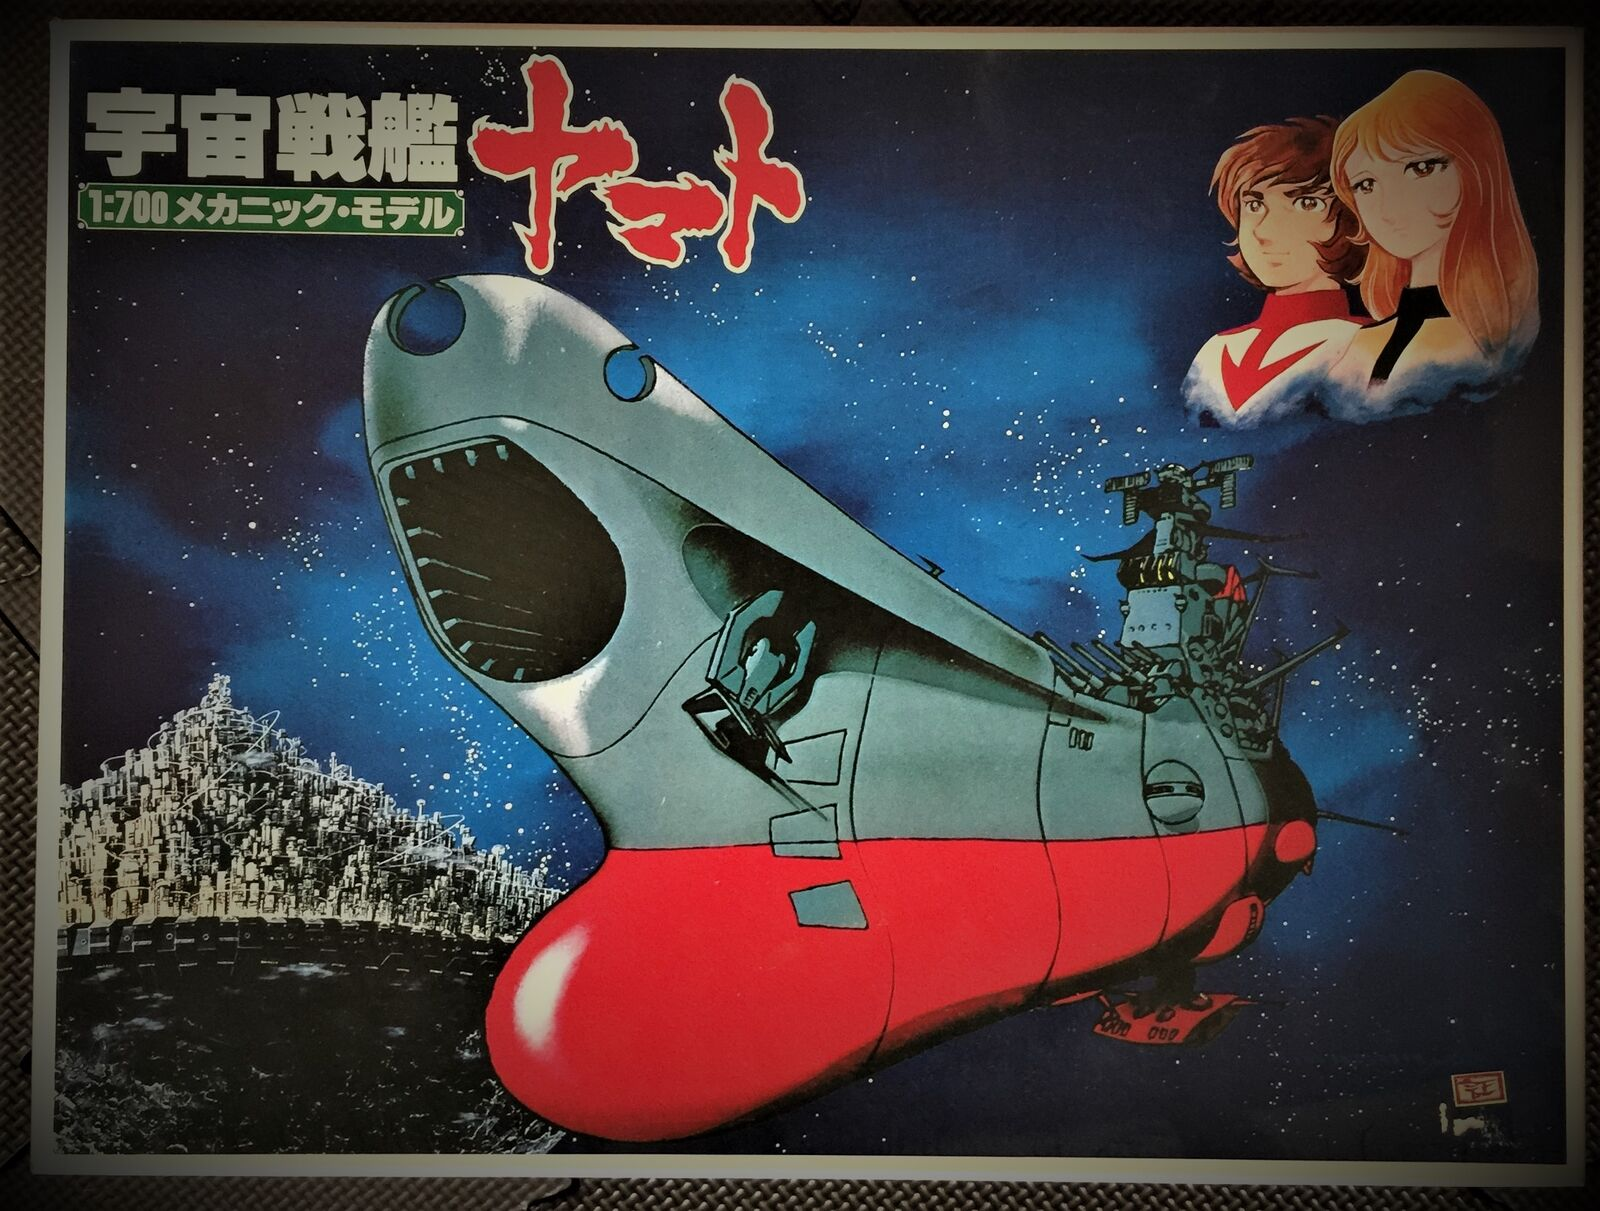 Rare  BANDAI Space Battleship YAMATO  1 700 Mechanic Model kit first version